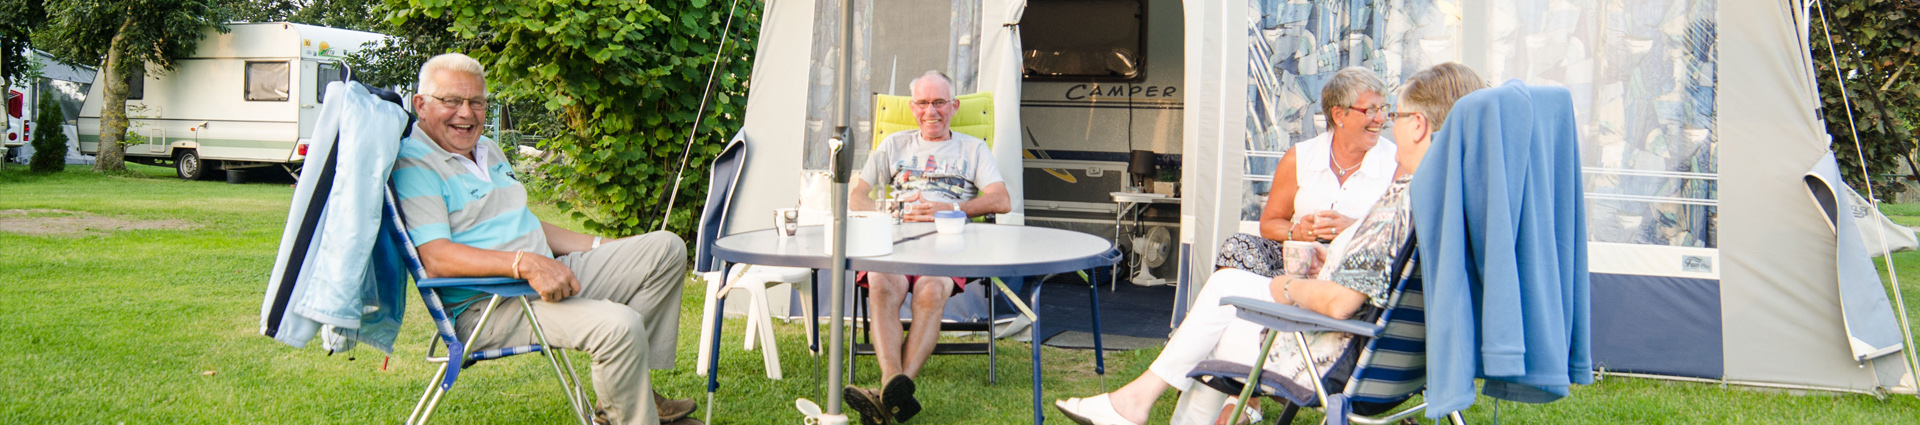 Mini Camping de Tesseplekke - Uitstekende camping voor ouderen